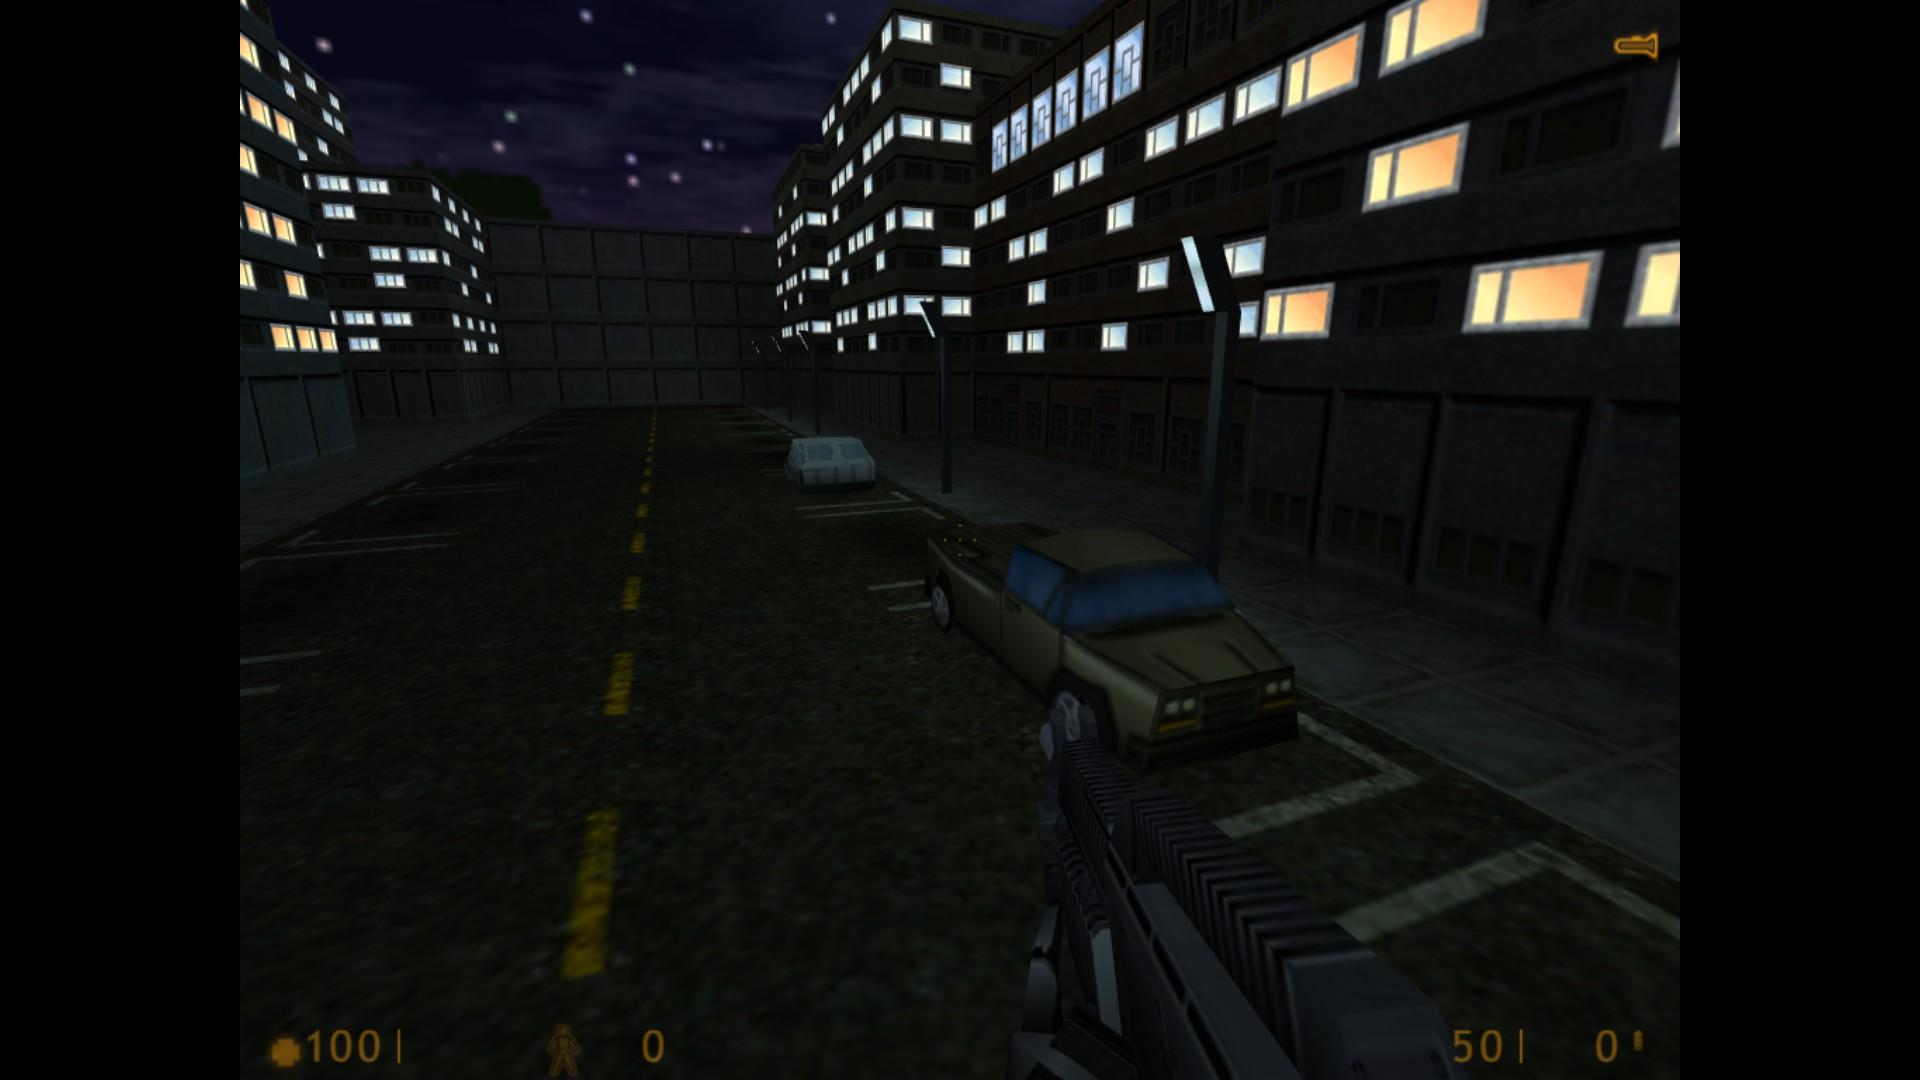 car models in game image - Shogo: Hydra mod for Half-Life